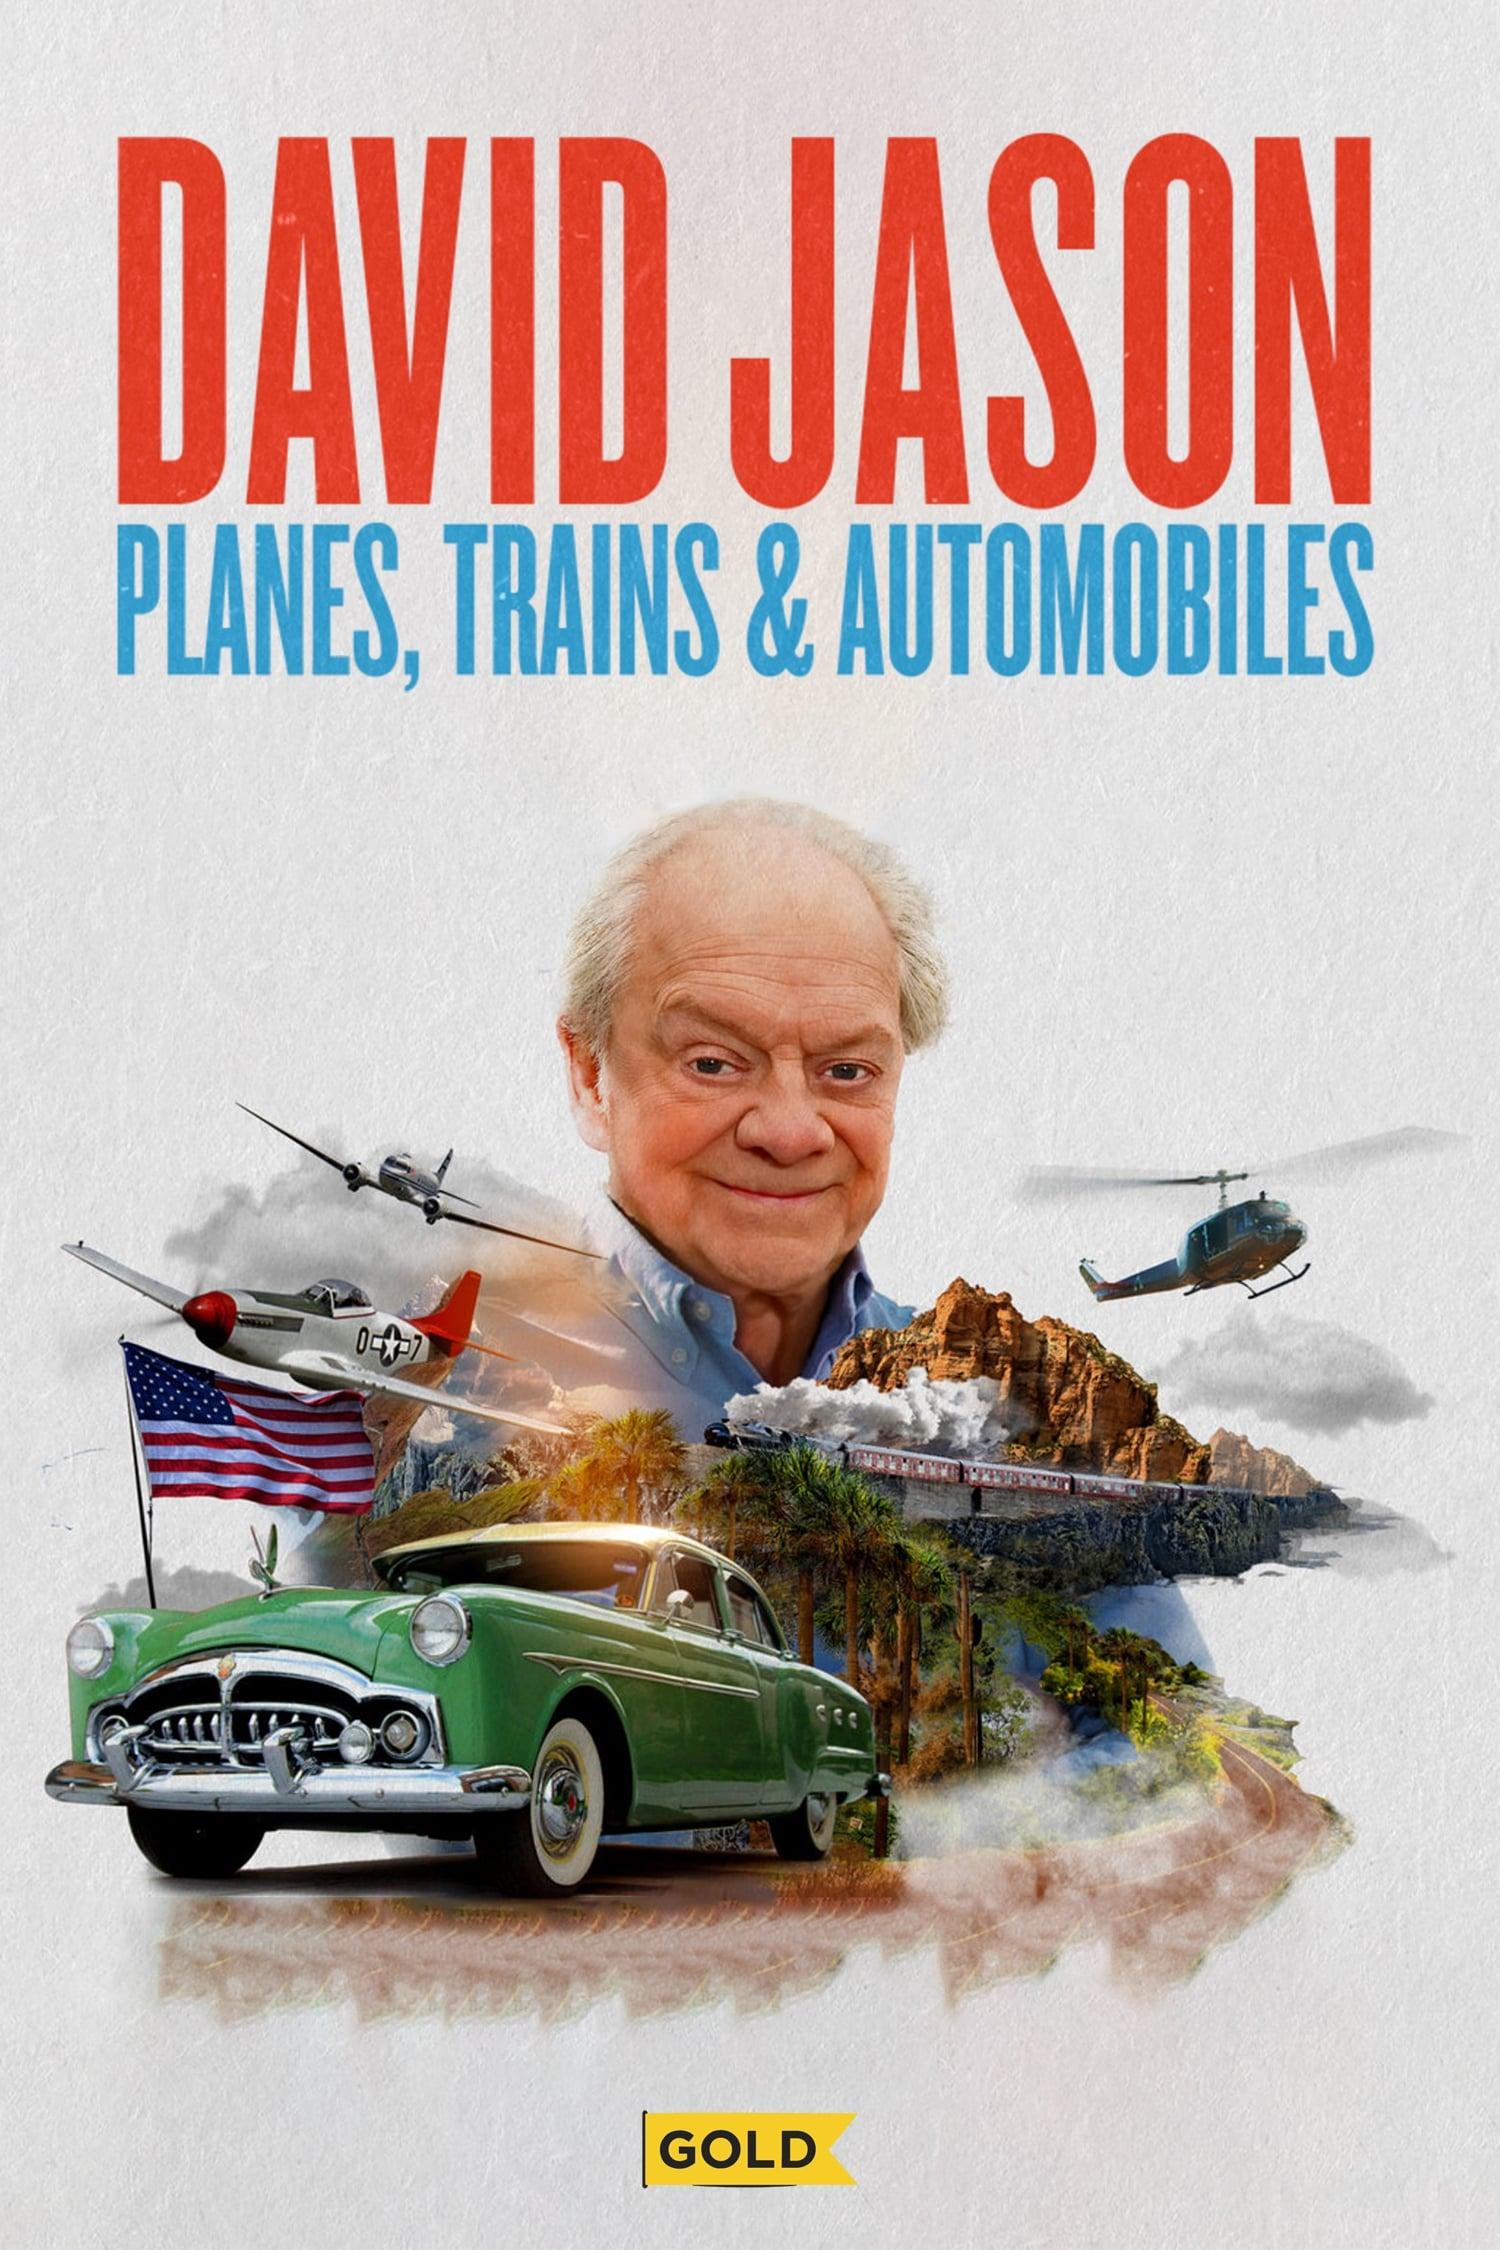 David Jason: Planes, Trains and Automobiles TV Shows About Rain